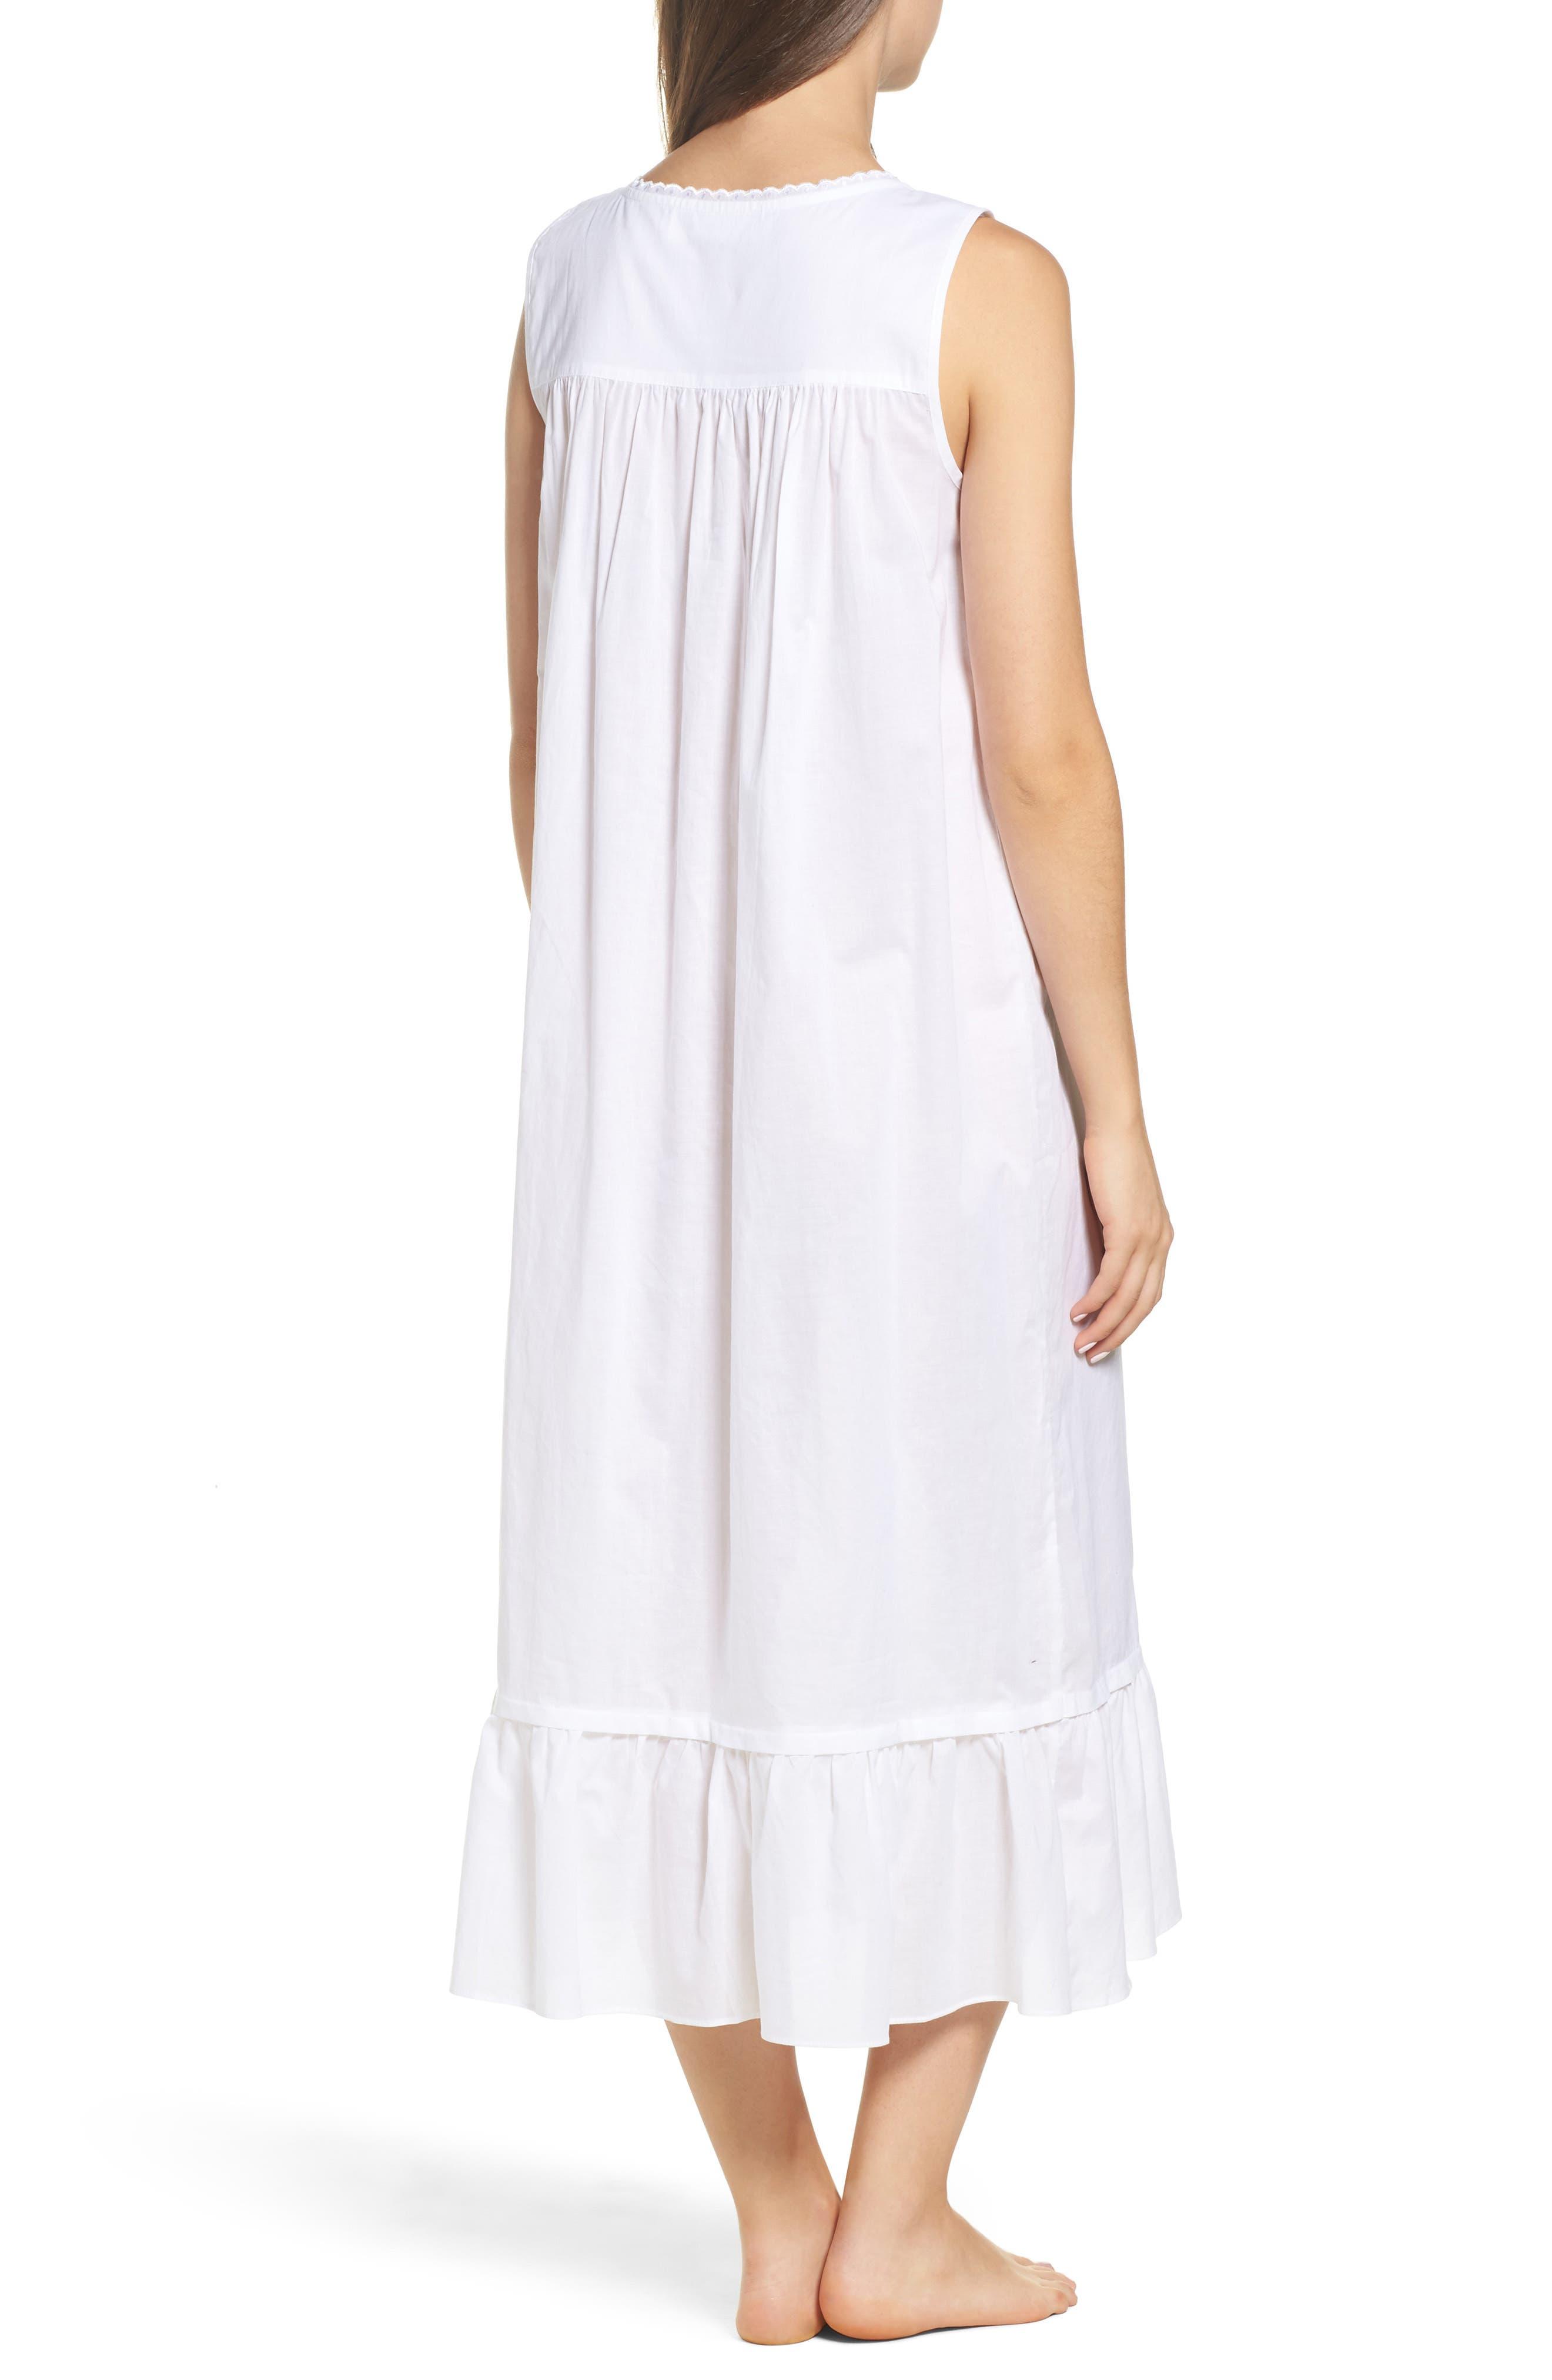 Ballet Nightgown,                             Alternate thumbnail 2, color,                             White